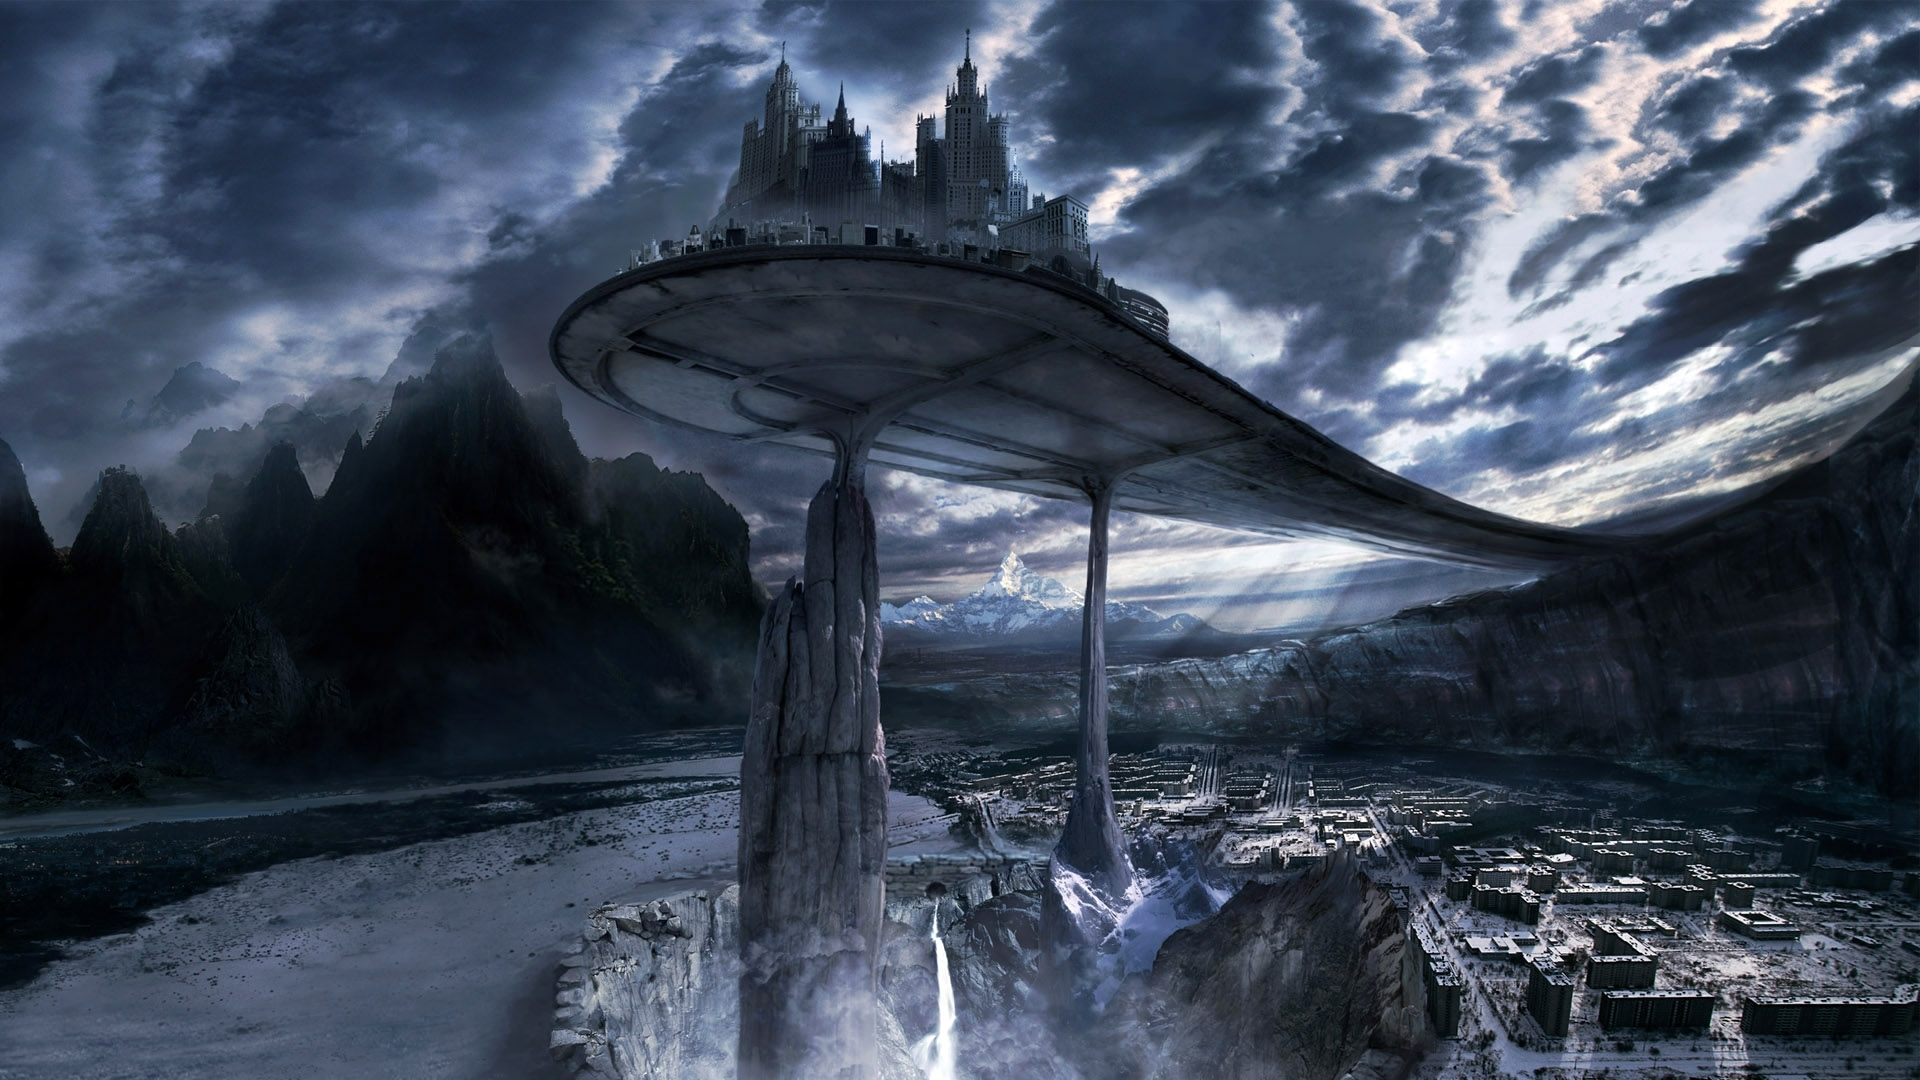 7452 скачать обои Облака, Замки, Фэнтези, Небо, Ночь - заставки и картинки бесплатно